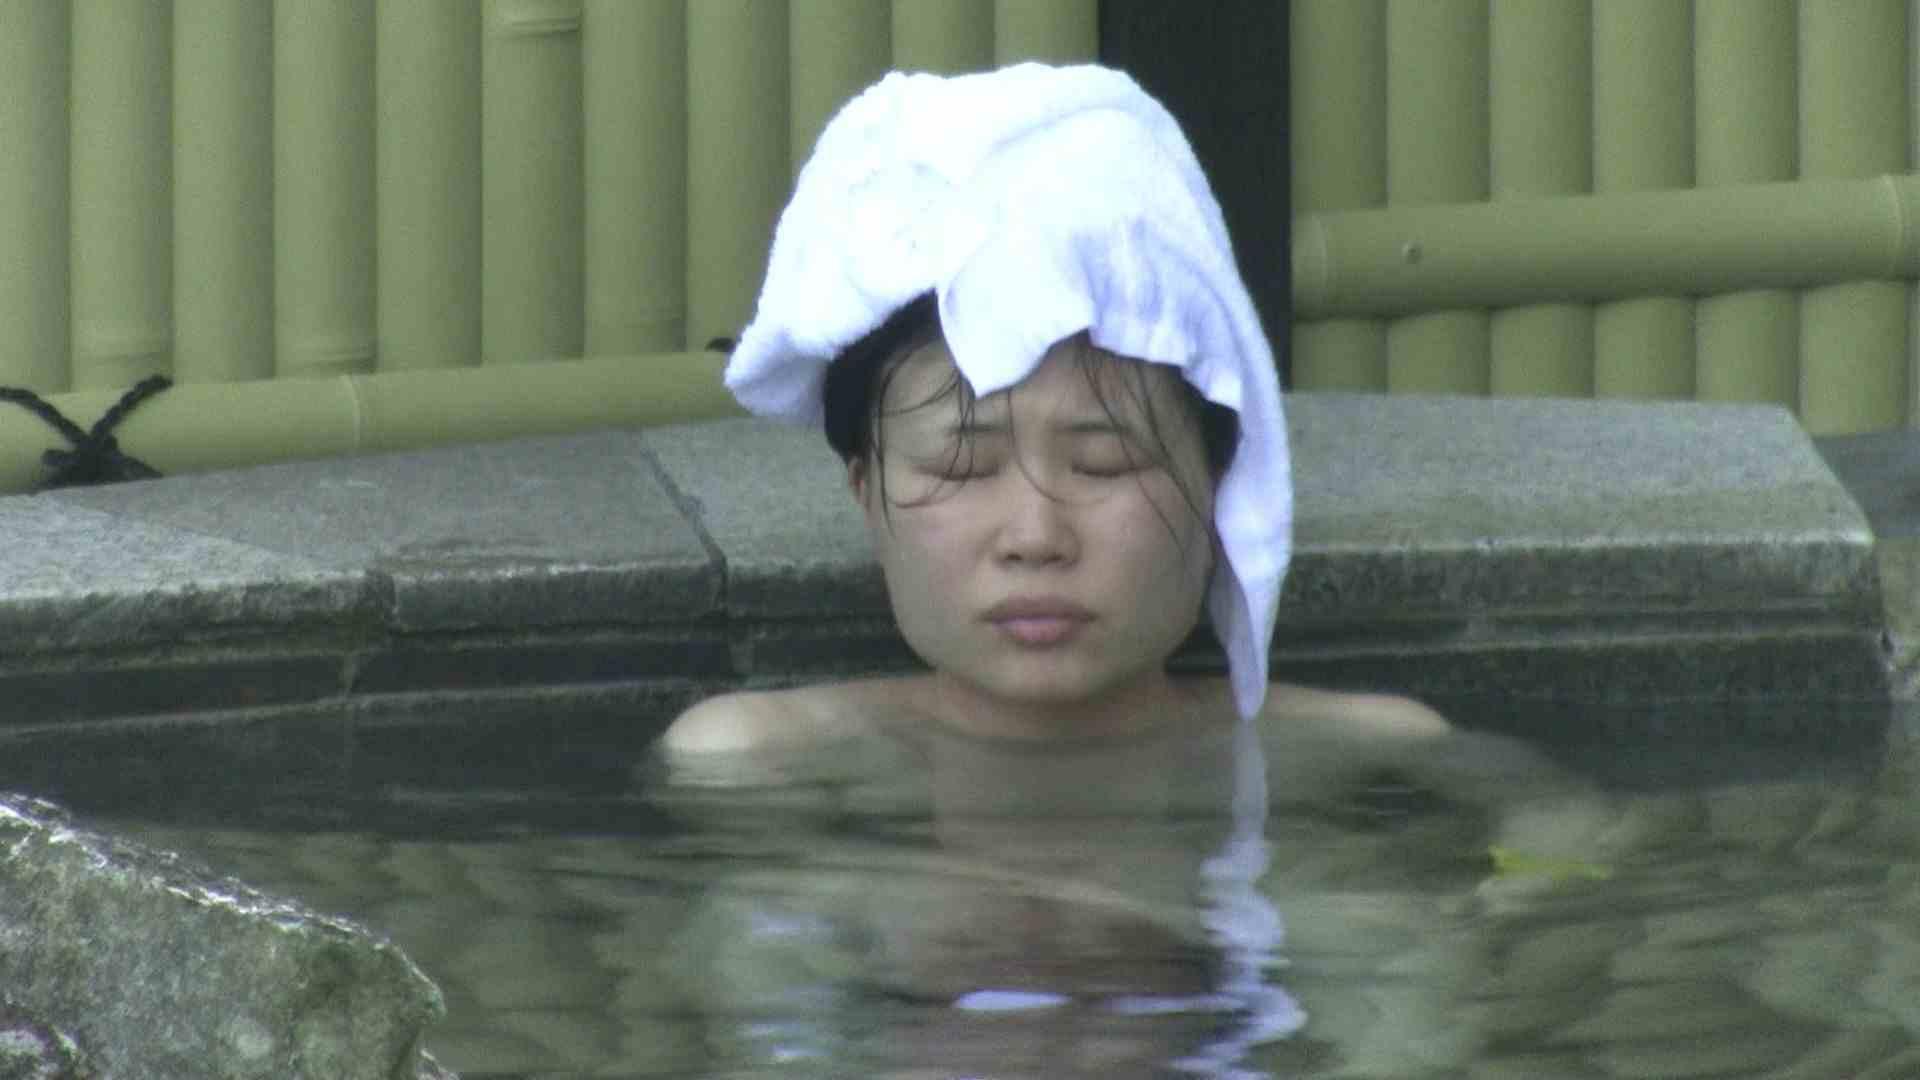 Aquaな露天風呂Vol.183 露天 濡れ場動画紹介 106pic 84